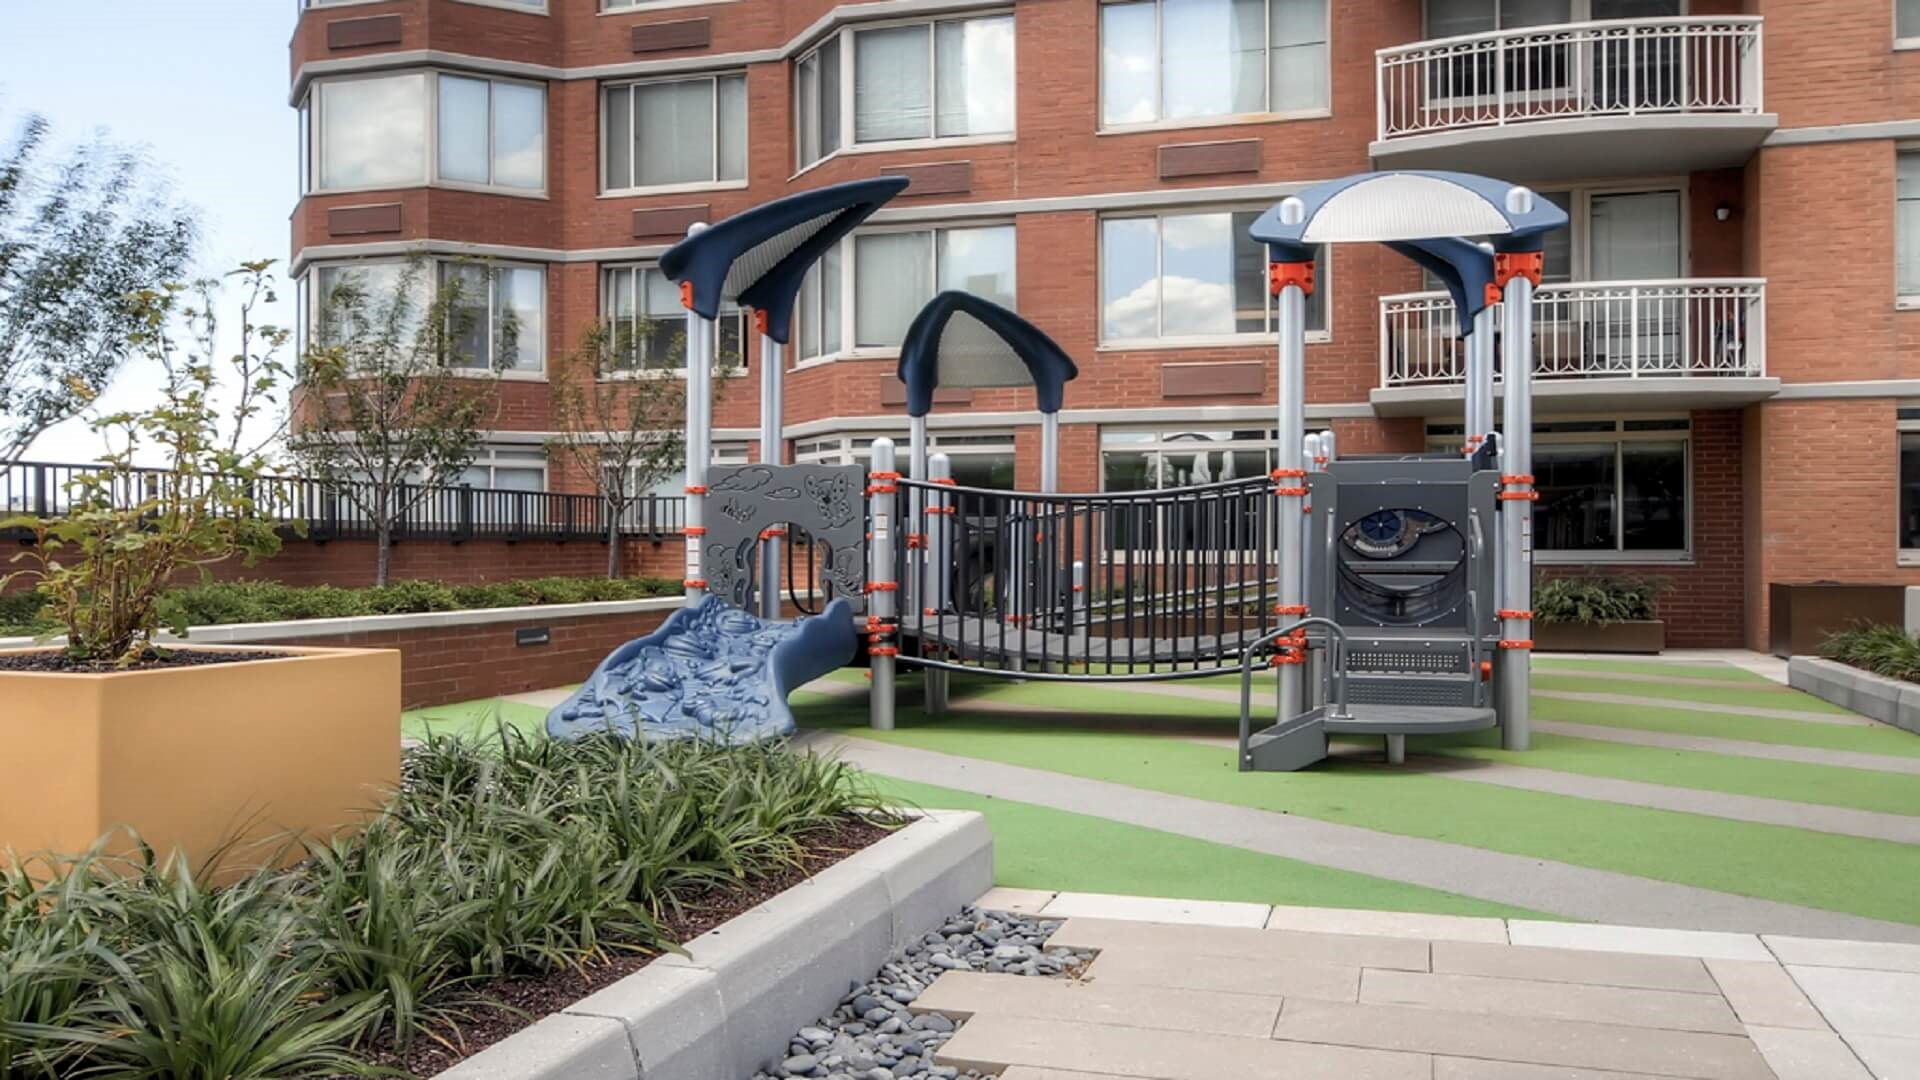 Playground at M2 Apartments, Hudson Exchange, Jersey City